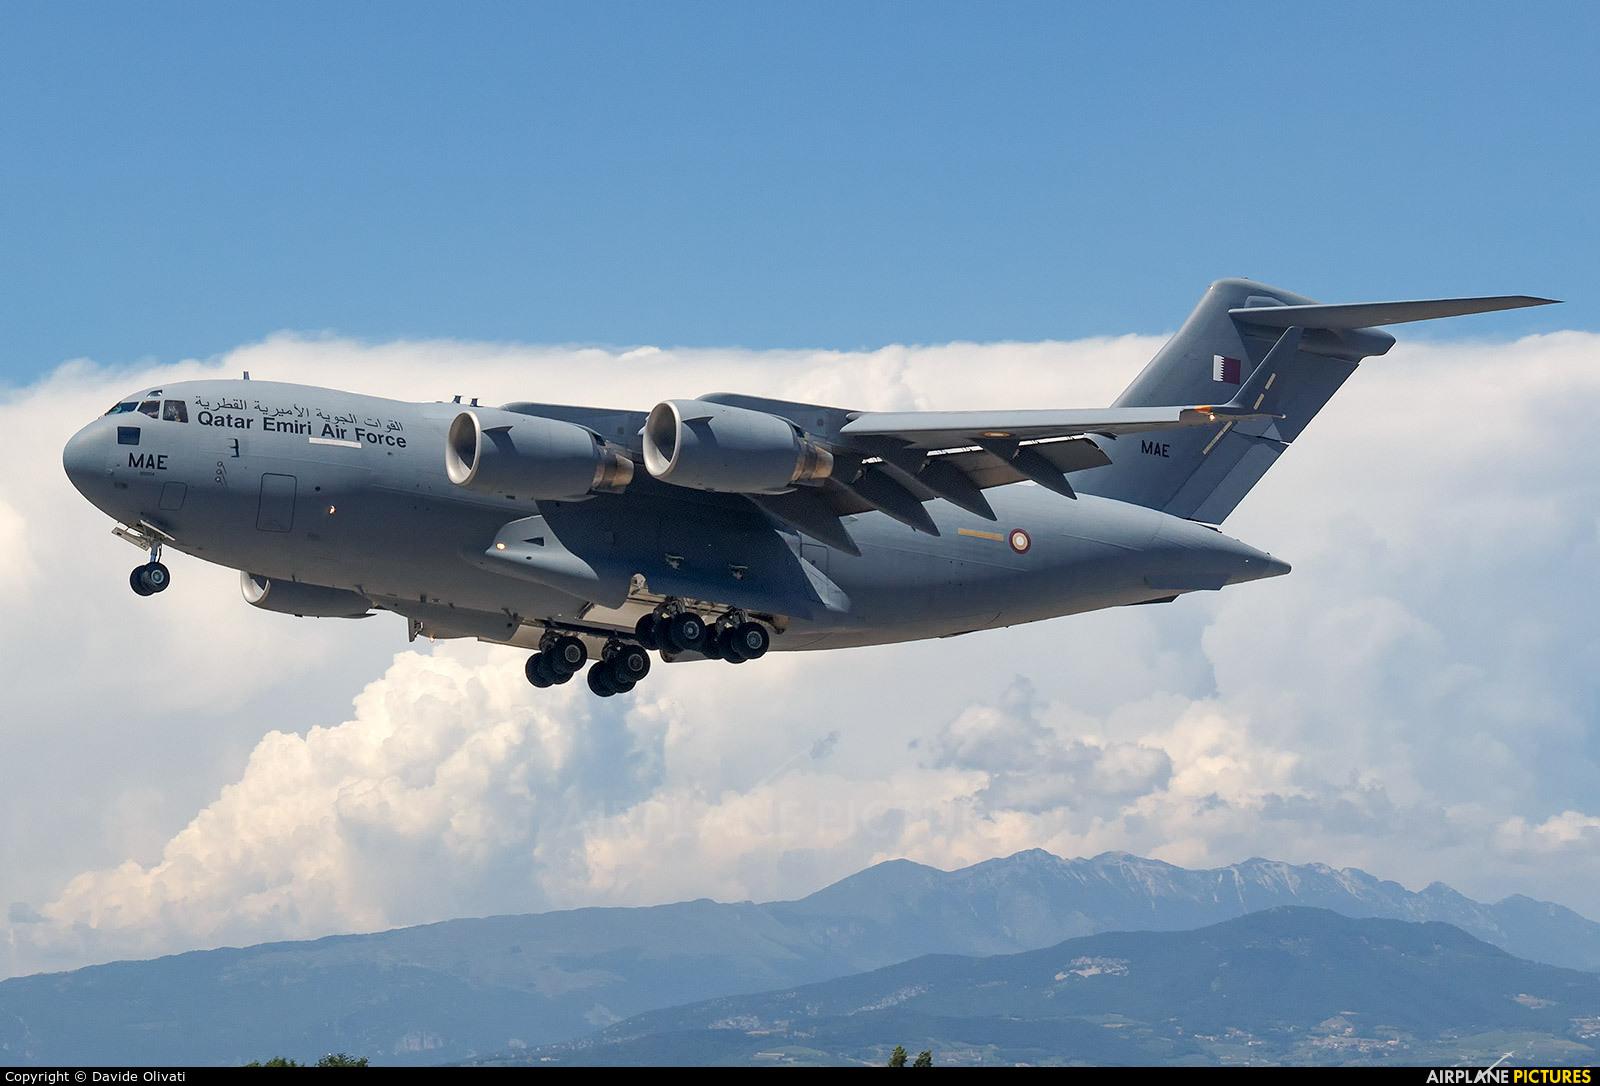 Qatar Amiri - Air Force A7-MAE aircraft at Verona - Villafranca